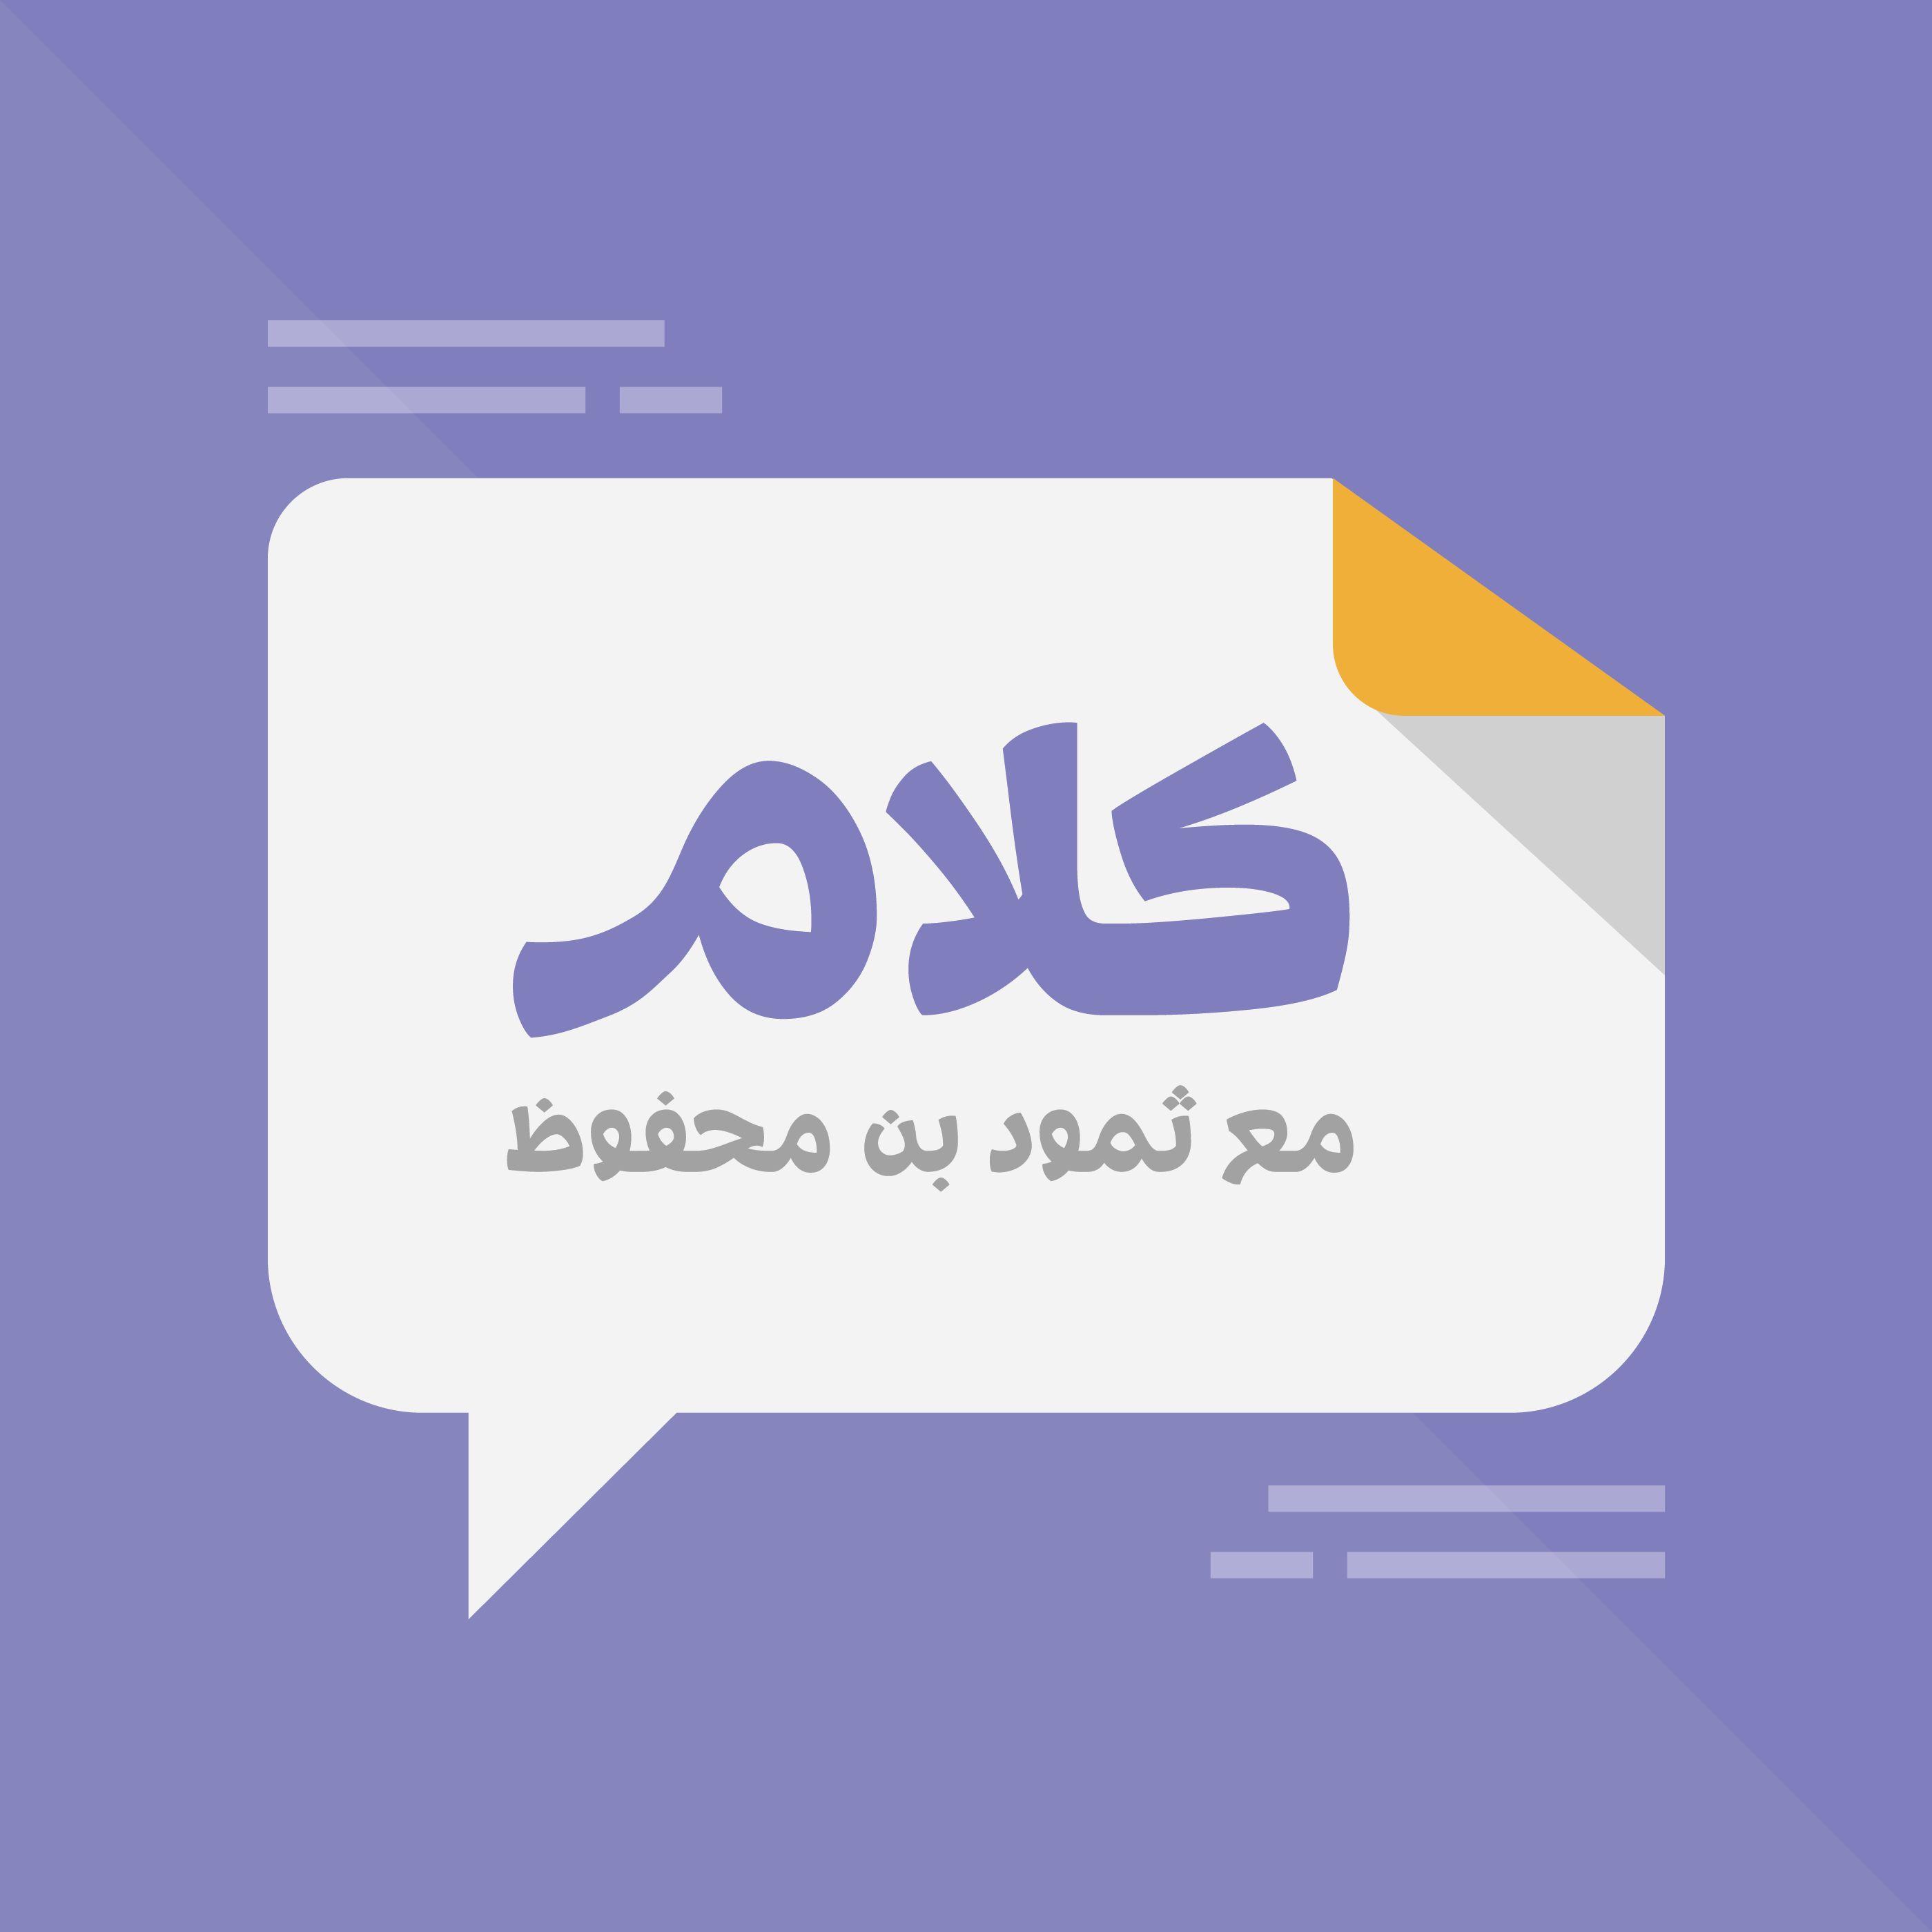 كلام 71: عبدالله باهبري من نوتا نوتا